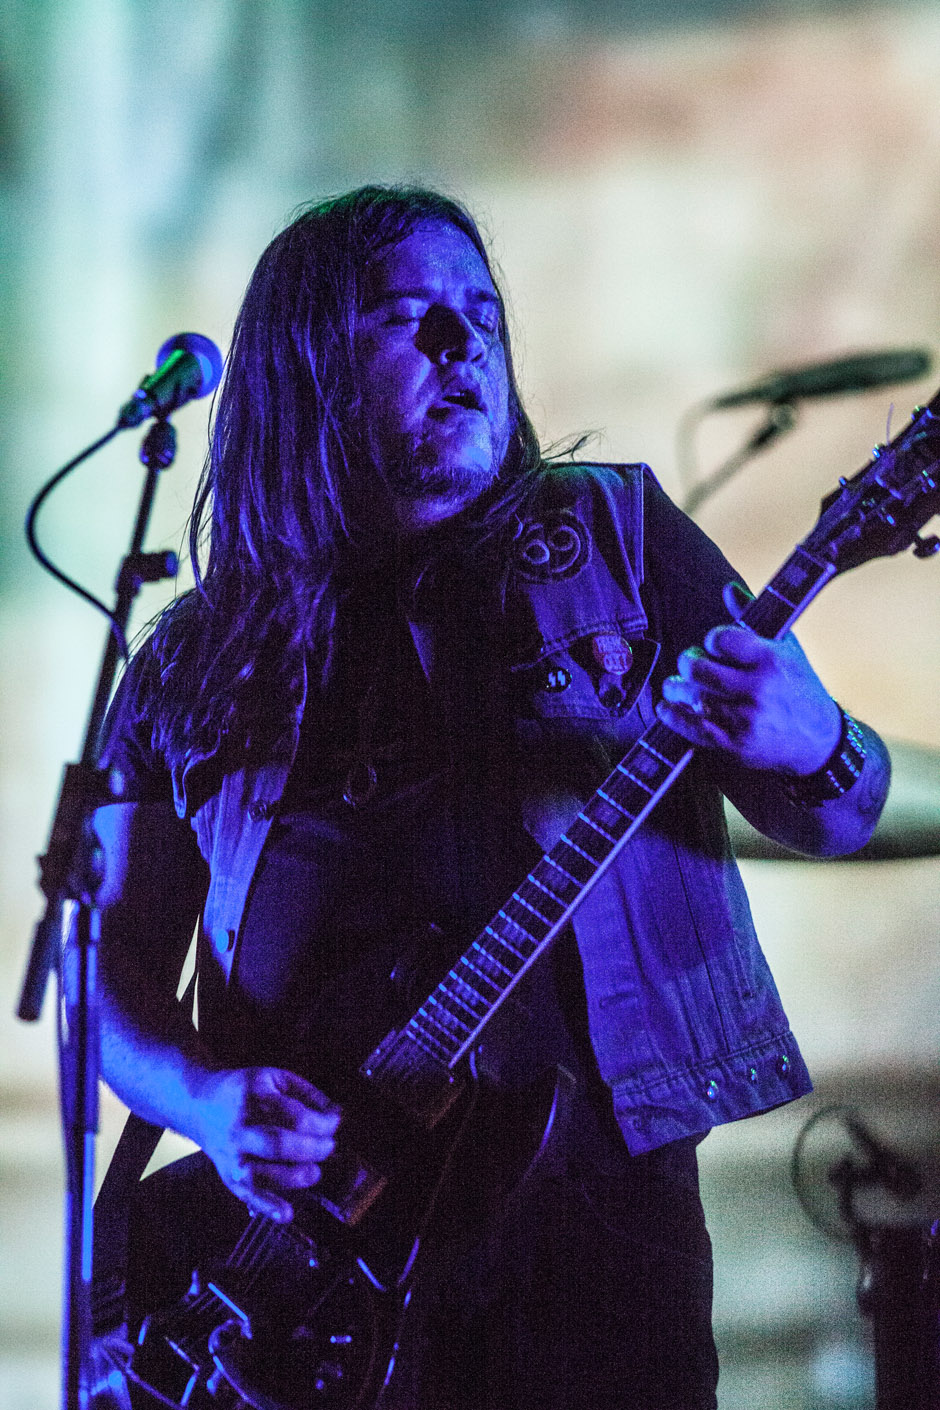 Electric Wizard live, Roadburn 2013